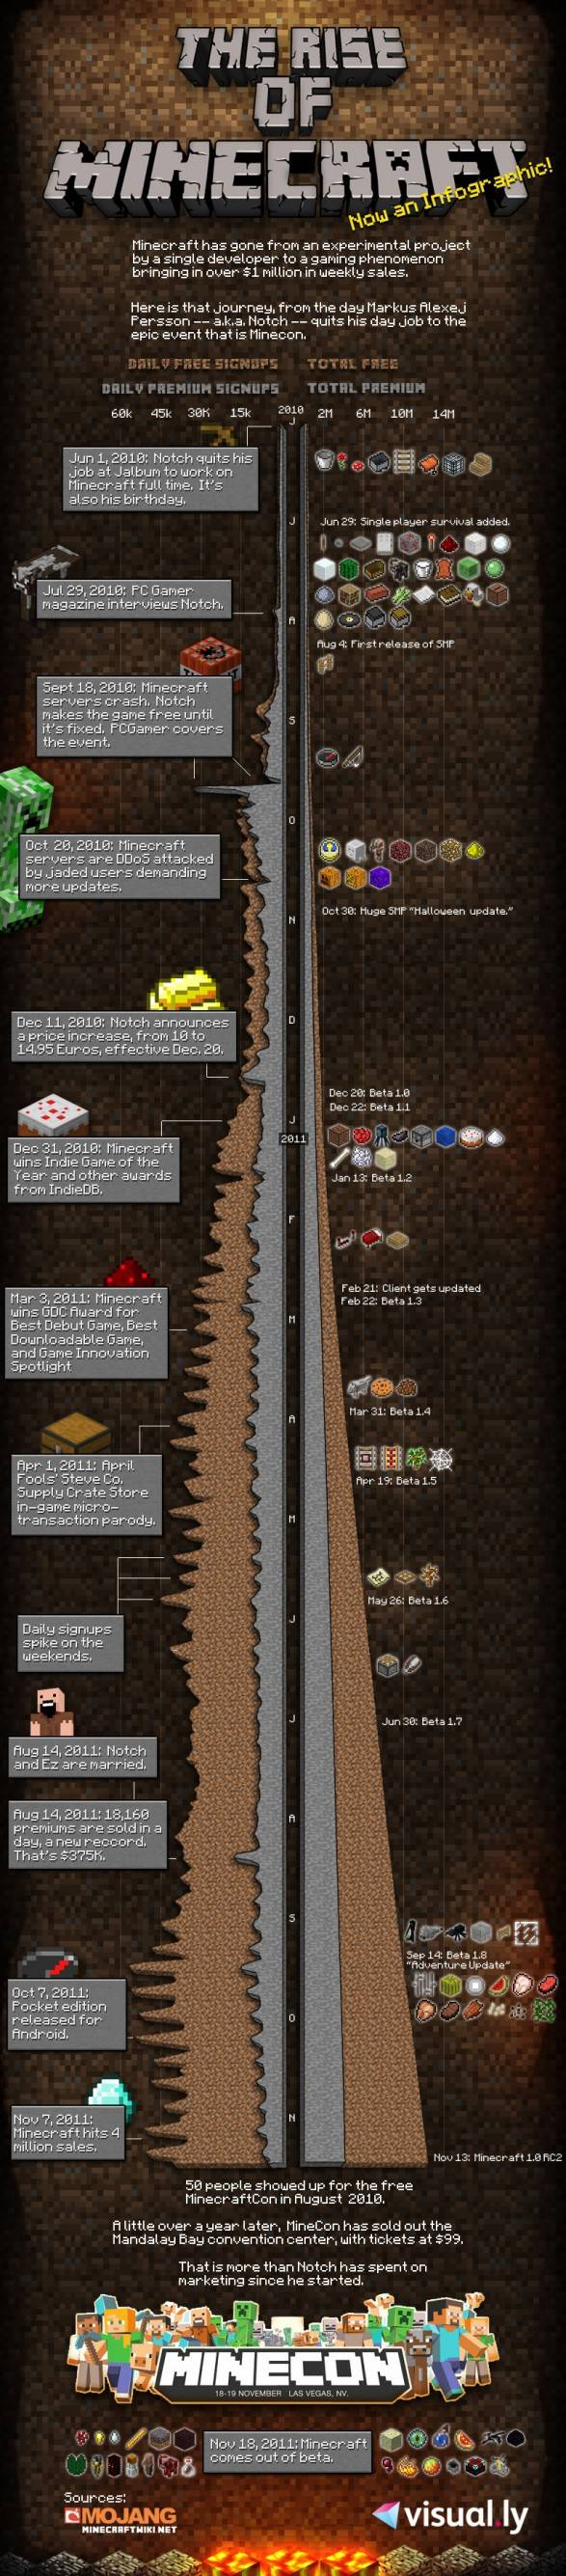 minecon-minecraft-rise